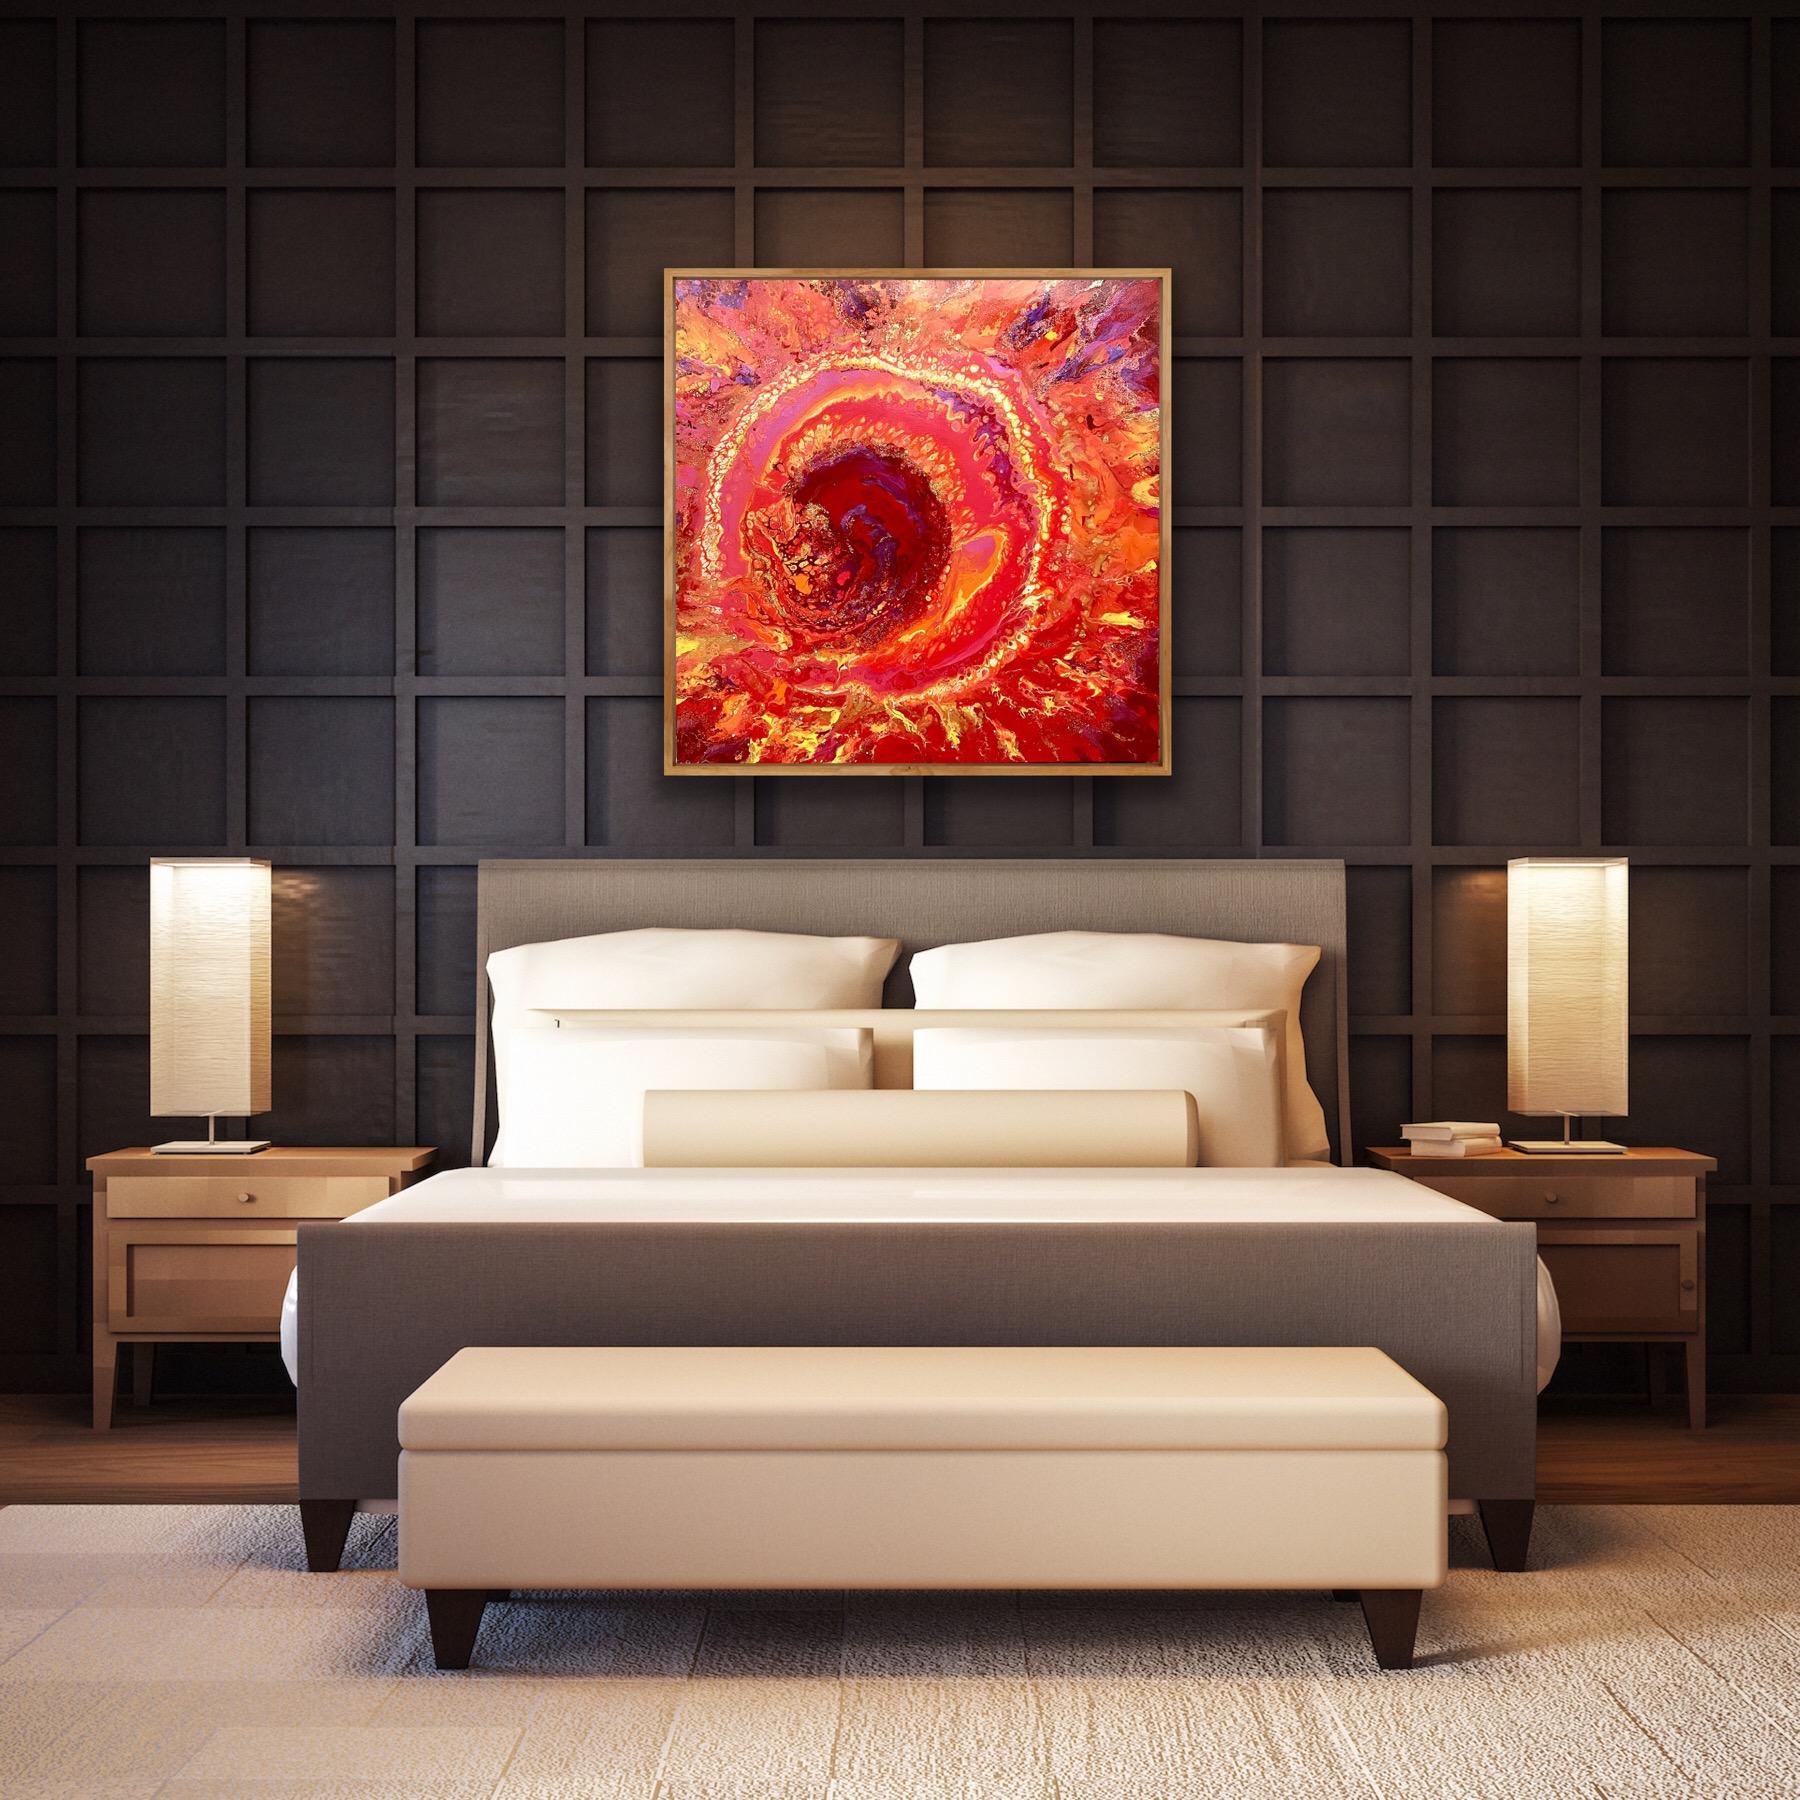 Eternal Flame by Amanda Stavast | ArtworkNetwork.com